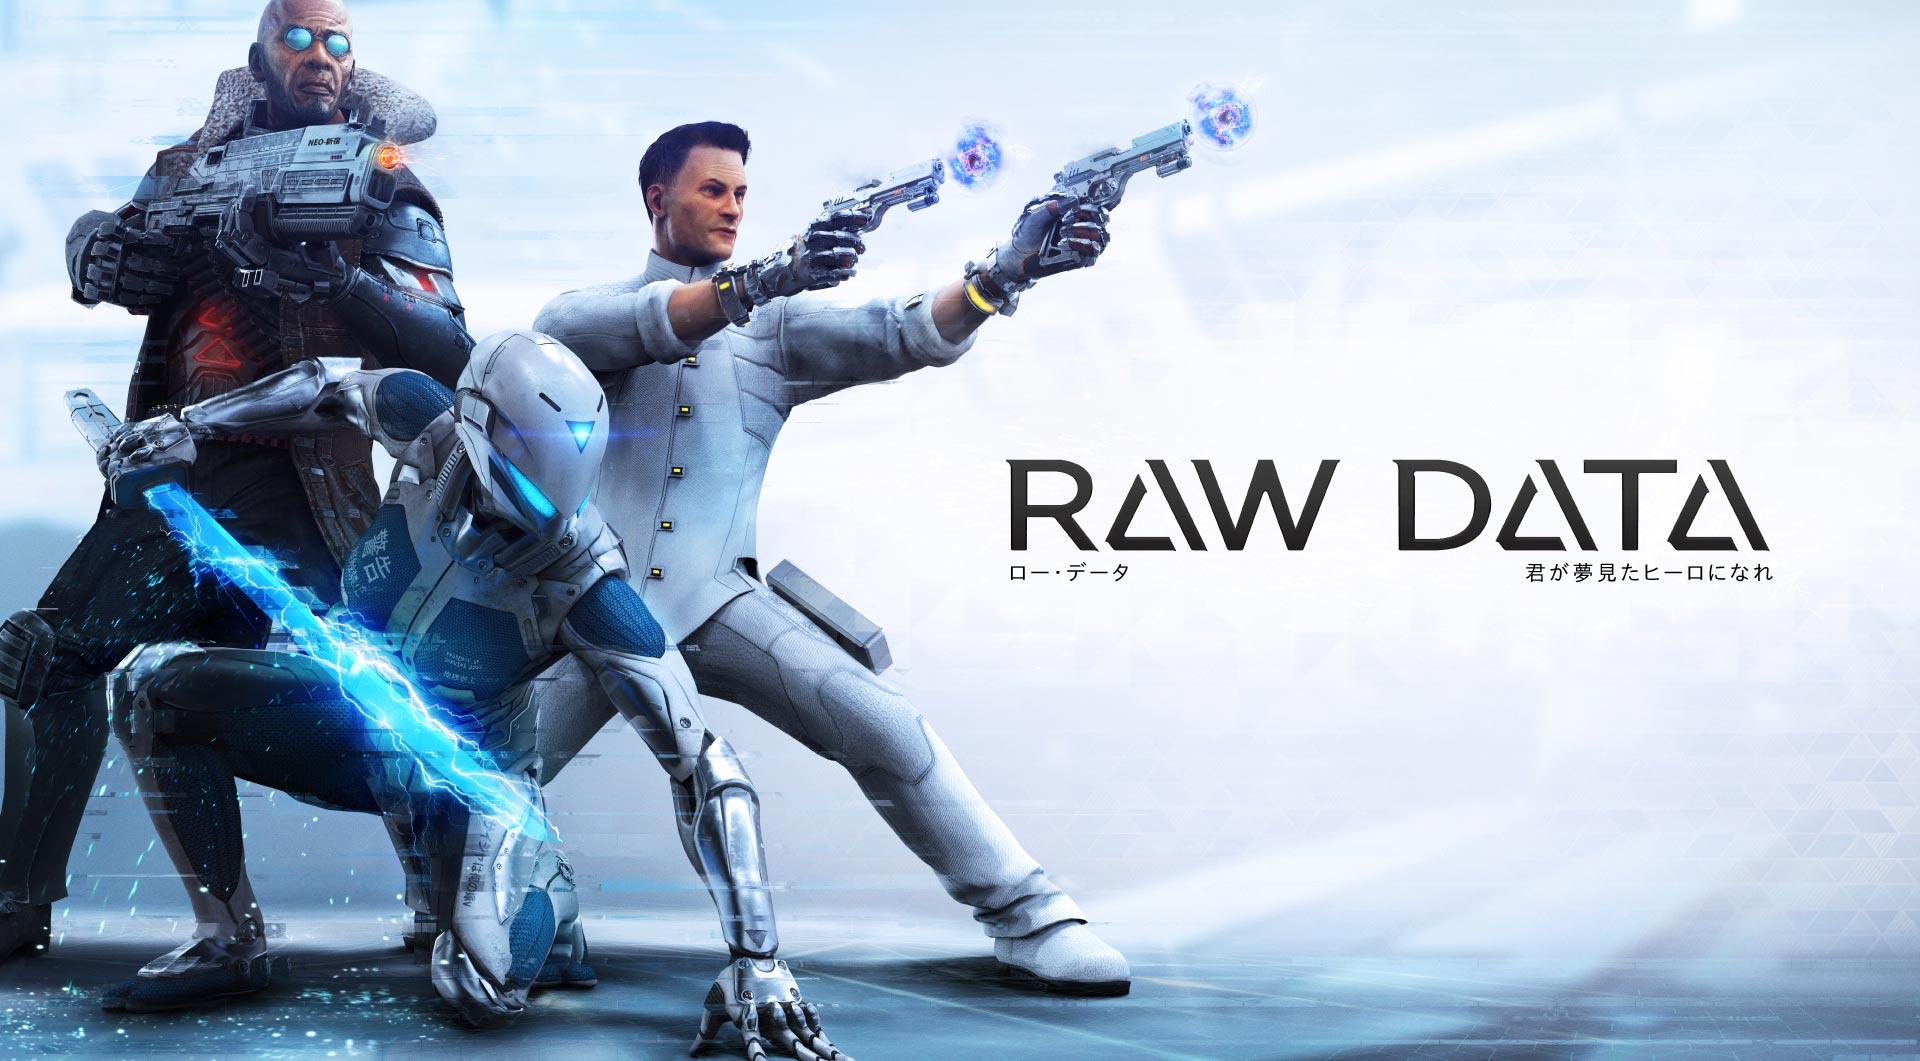 Raw Data sur Playstation VR